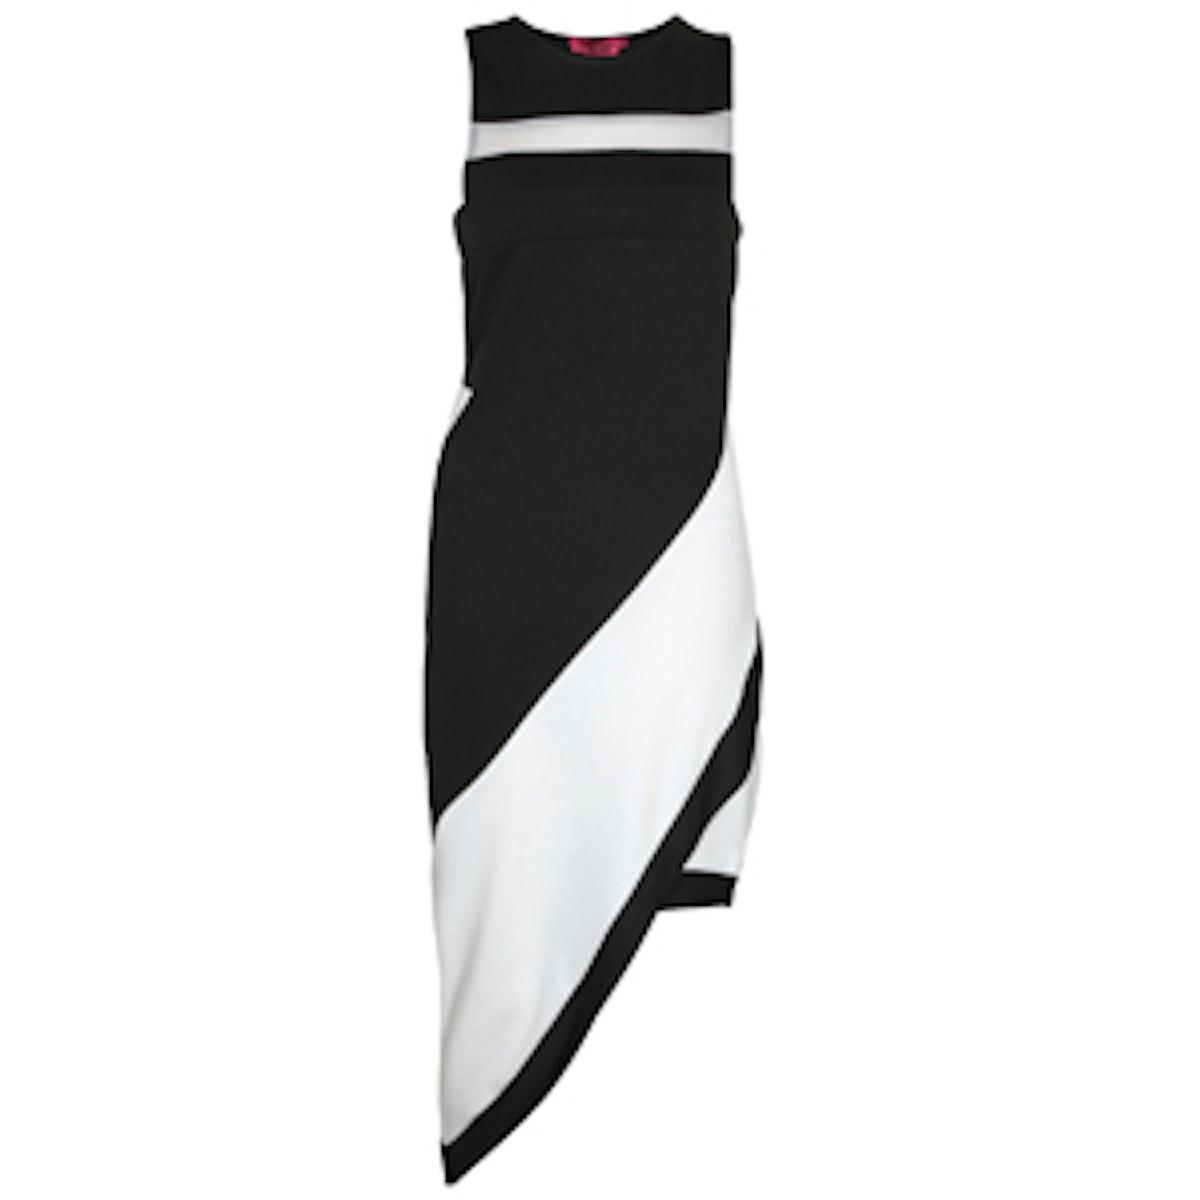 Annabelle Asymmetric Monochrome Dress